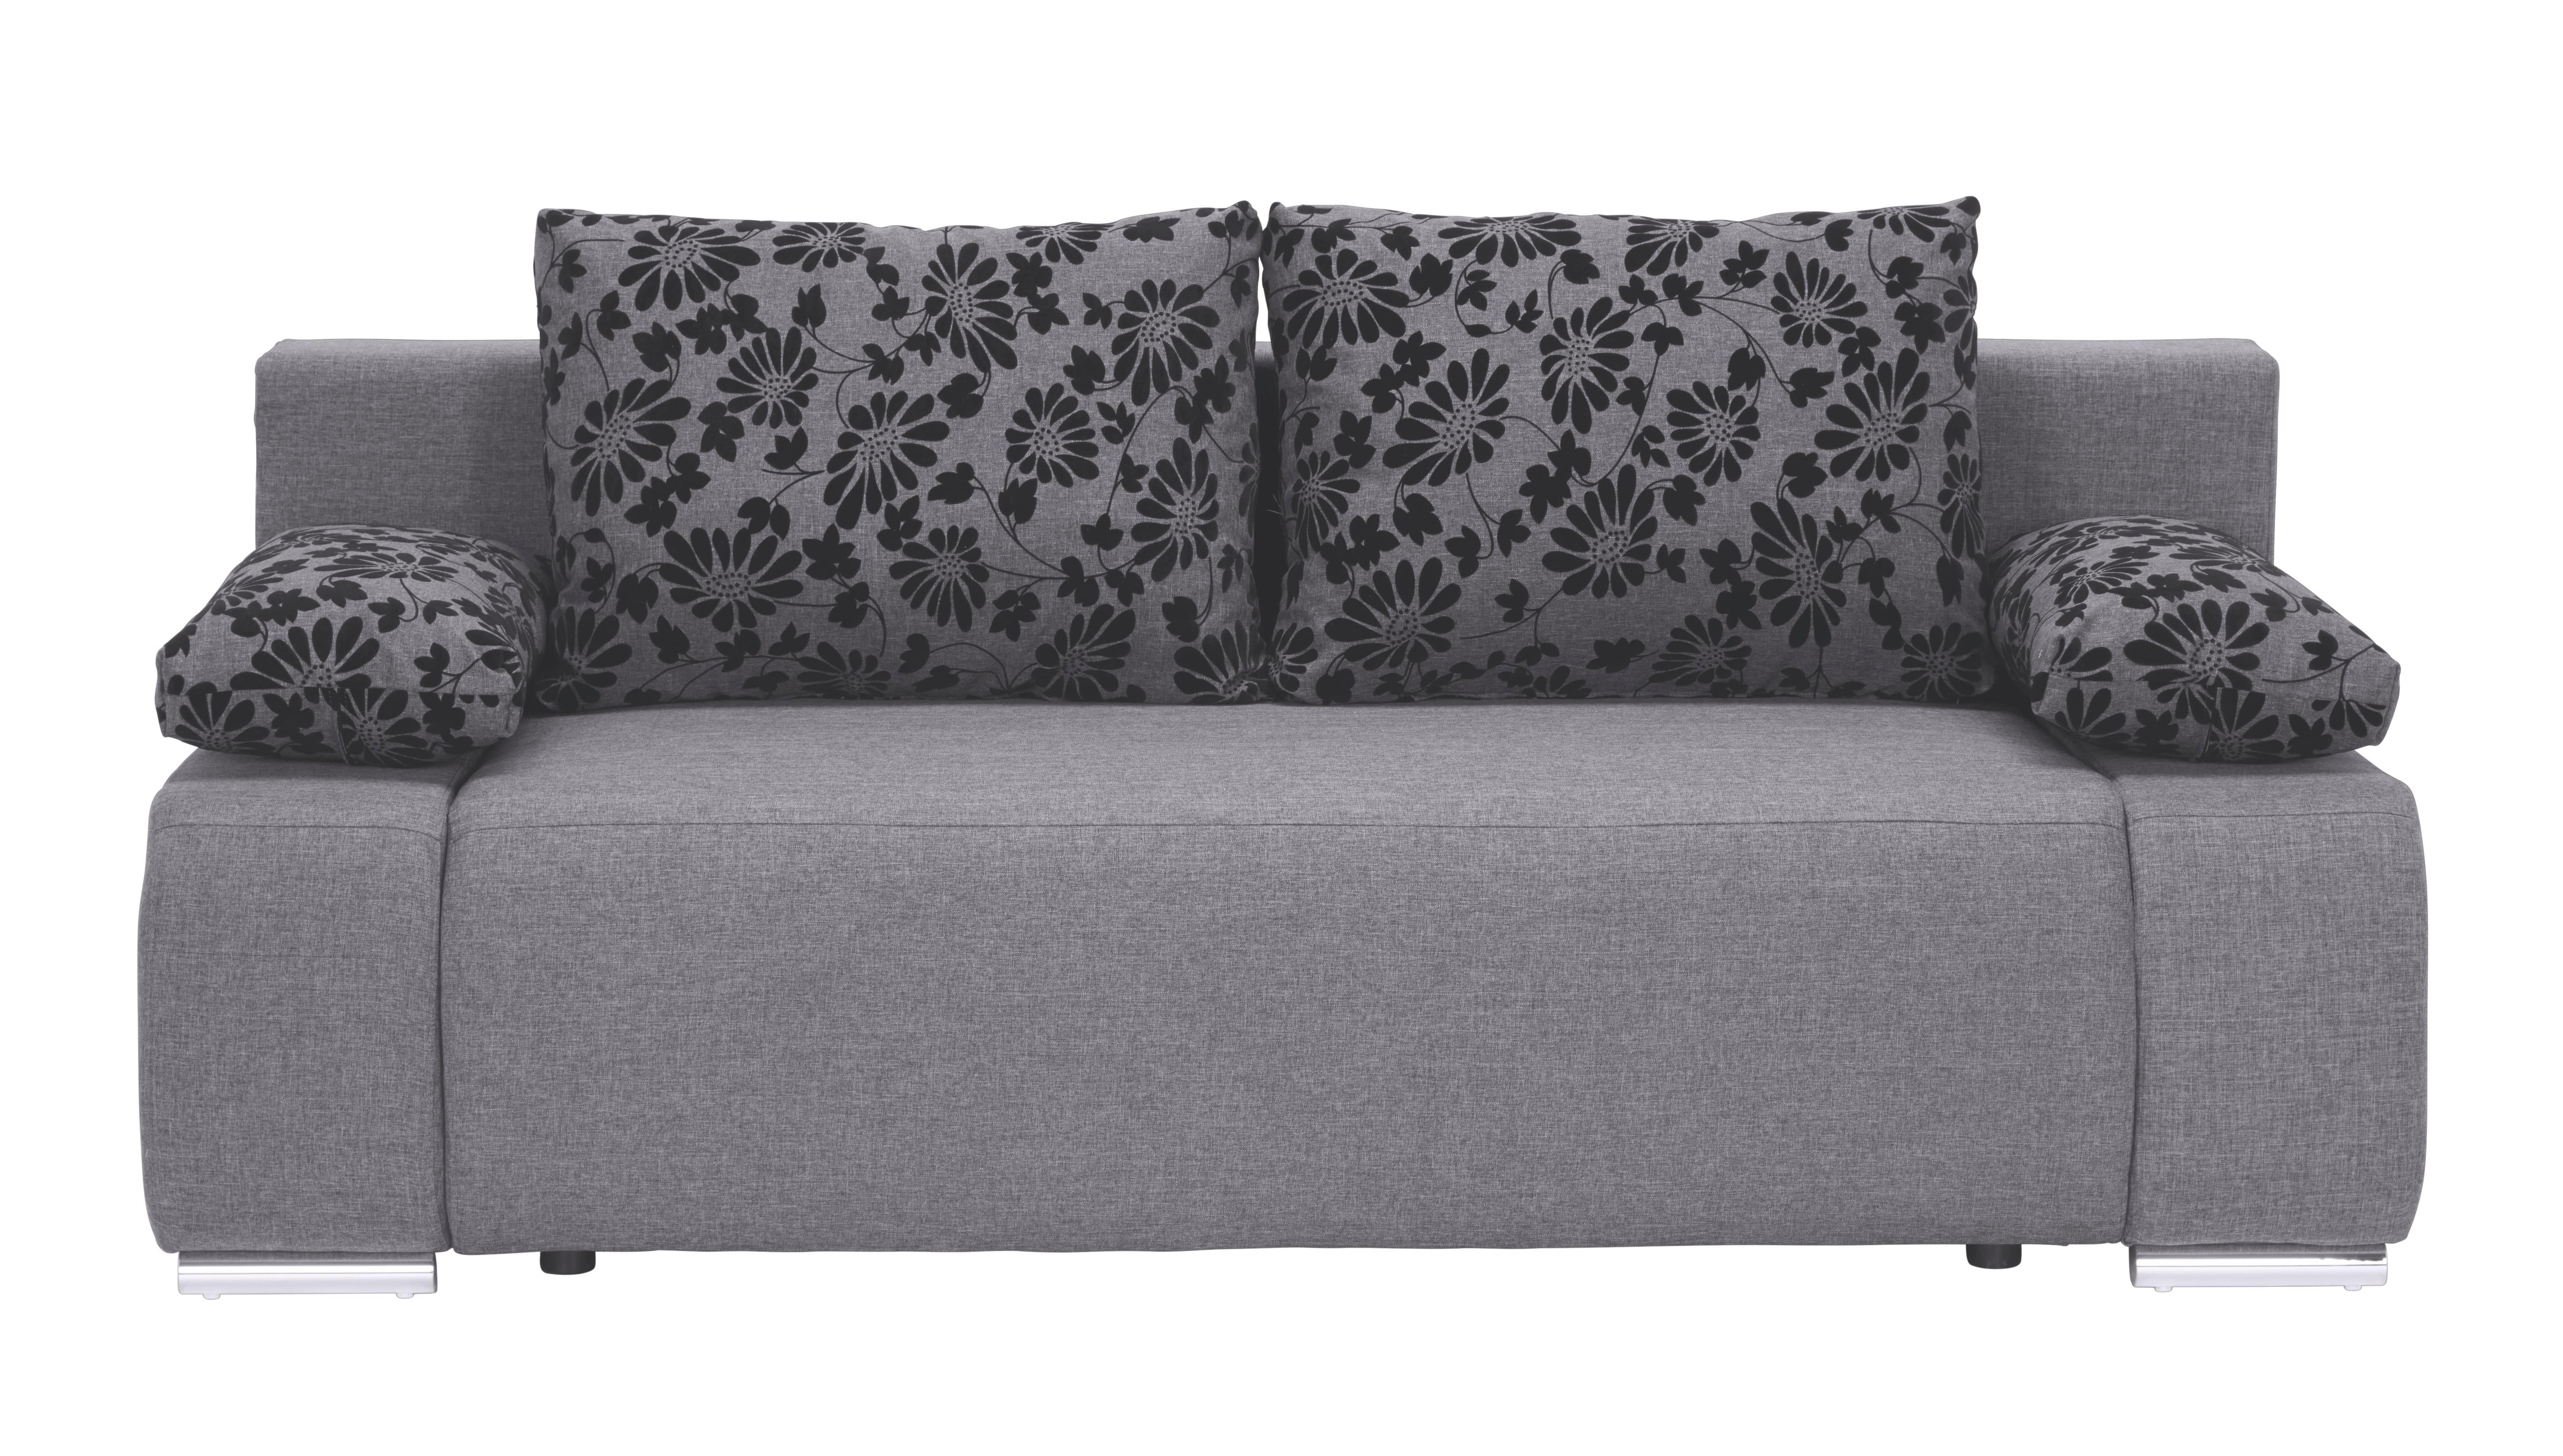 Couch Grau Schwarz Fabulous Stretch Sofa Schonbezug Abdeckung Mode